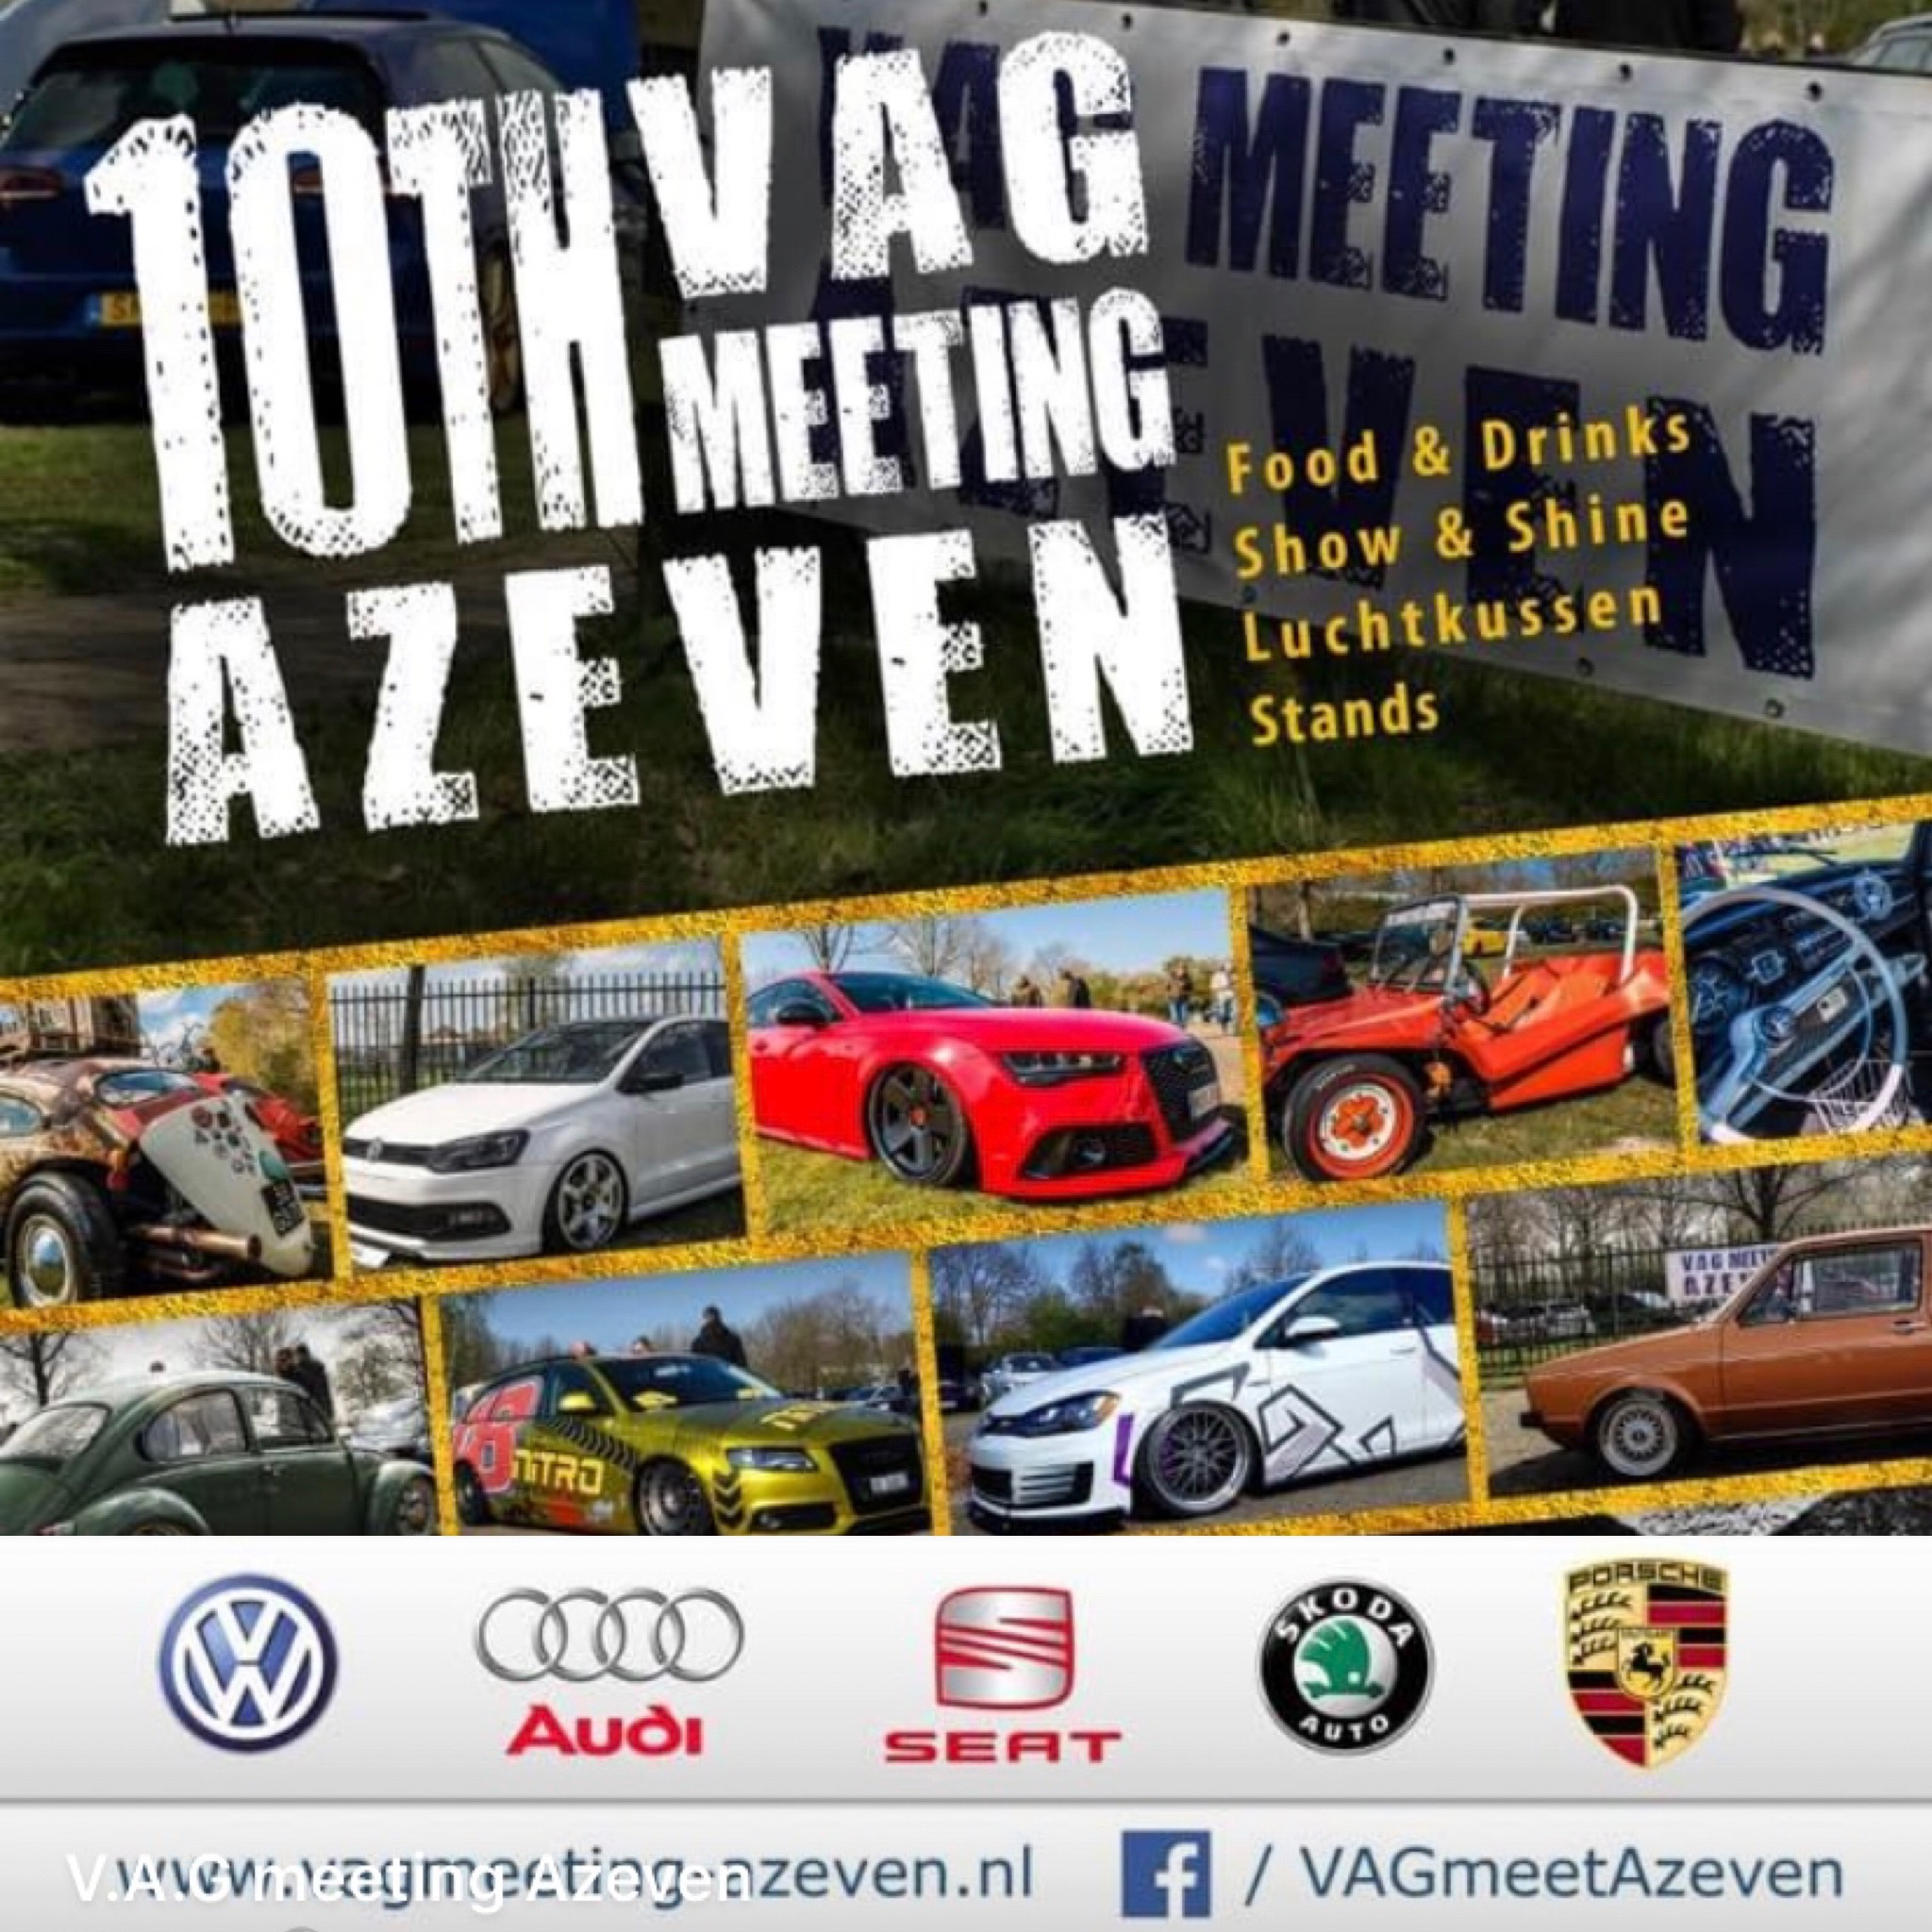 10th Event Vag Meeting Azeven @ Fries Congres centrum